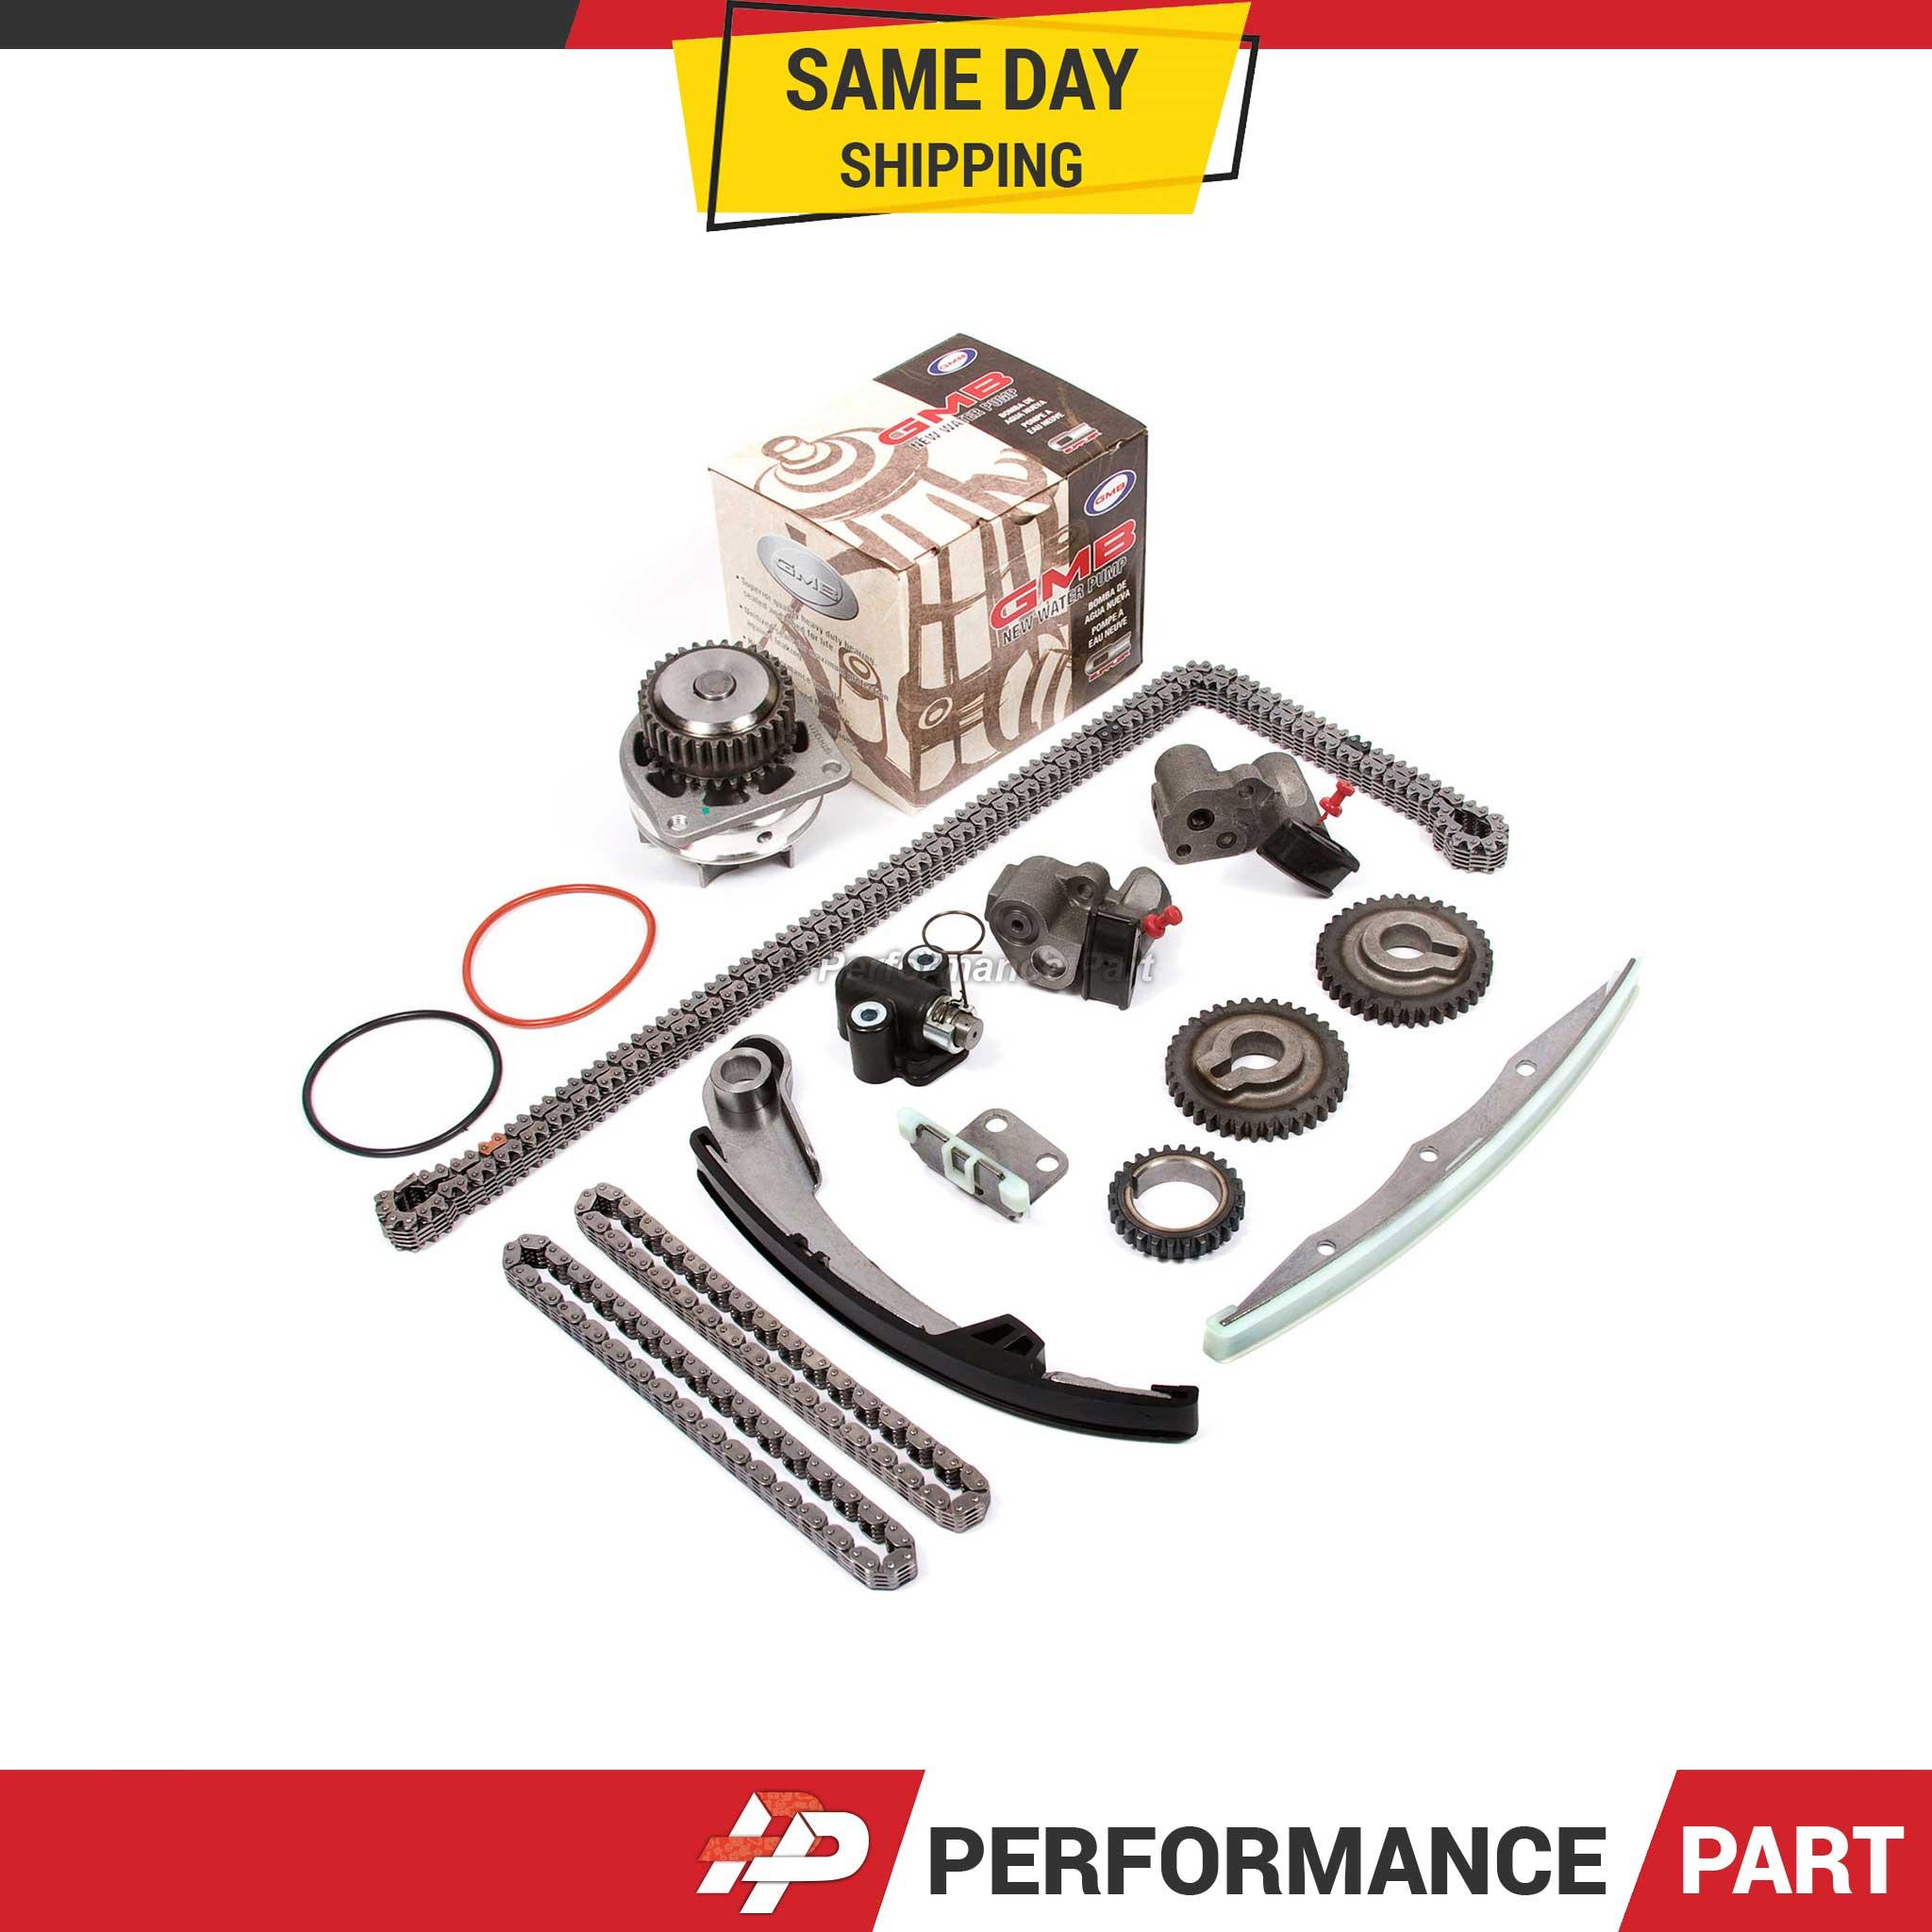 1998 Nissan Maxima Water Pump Quest Timing Belt Fits Altima Dohc De Chain Kit 2048x2048